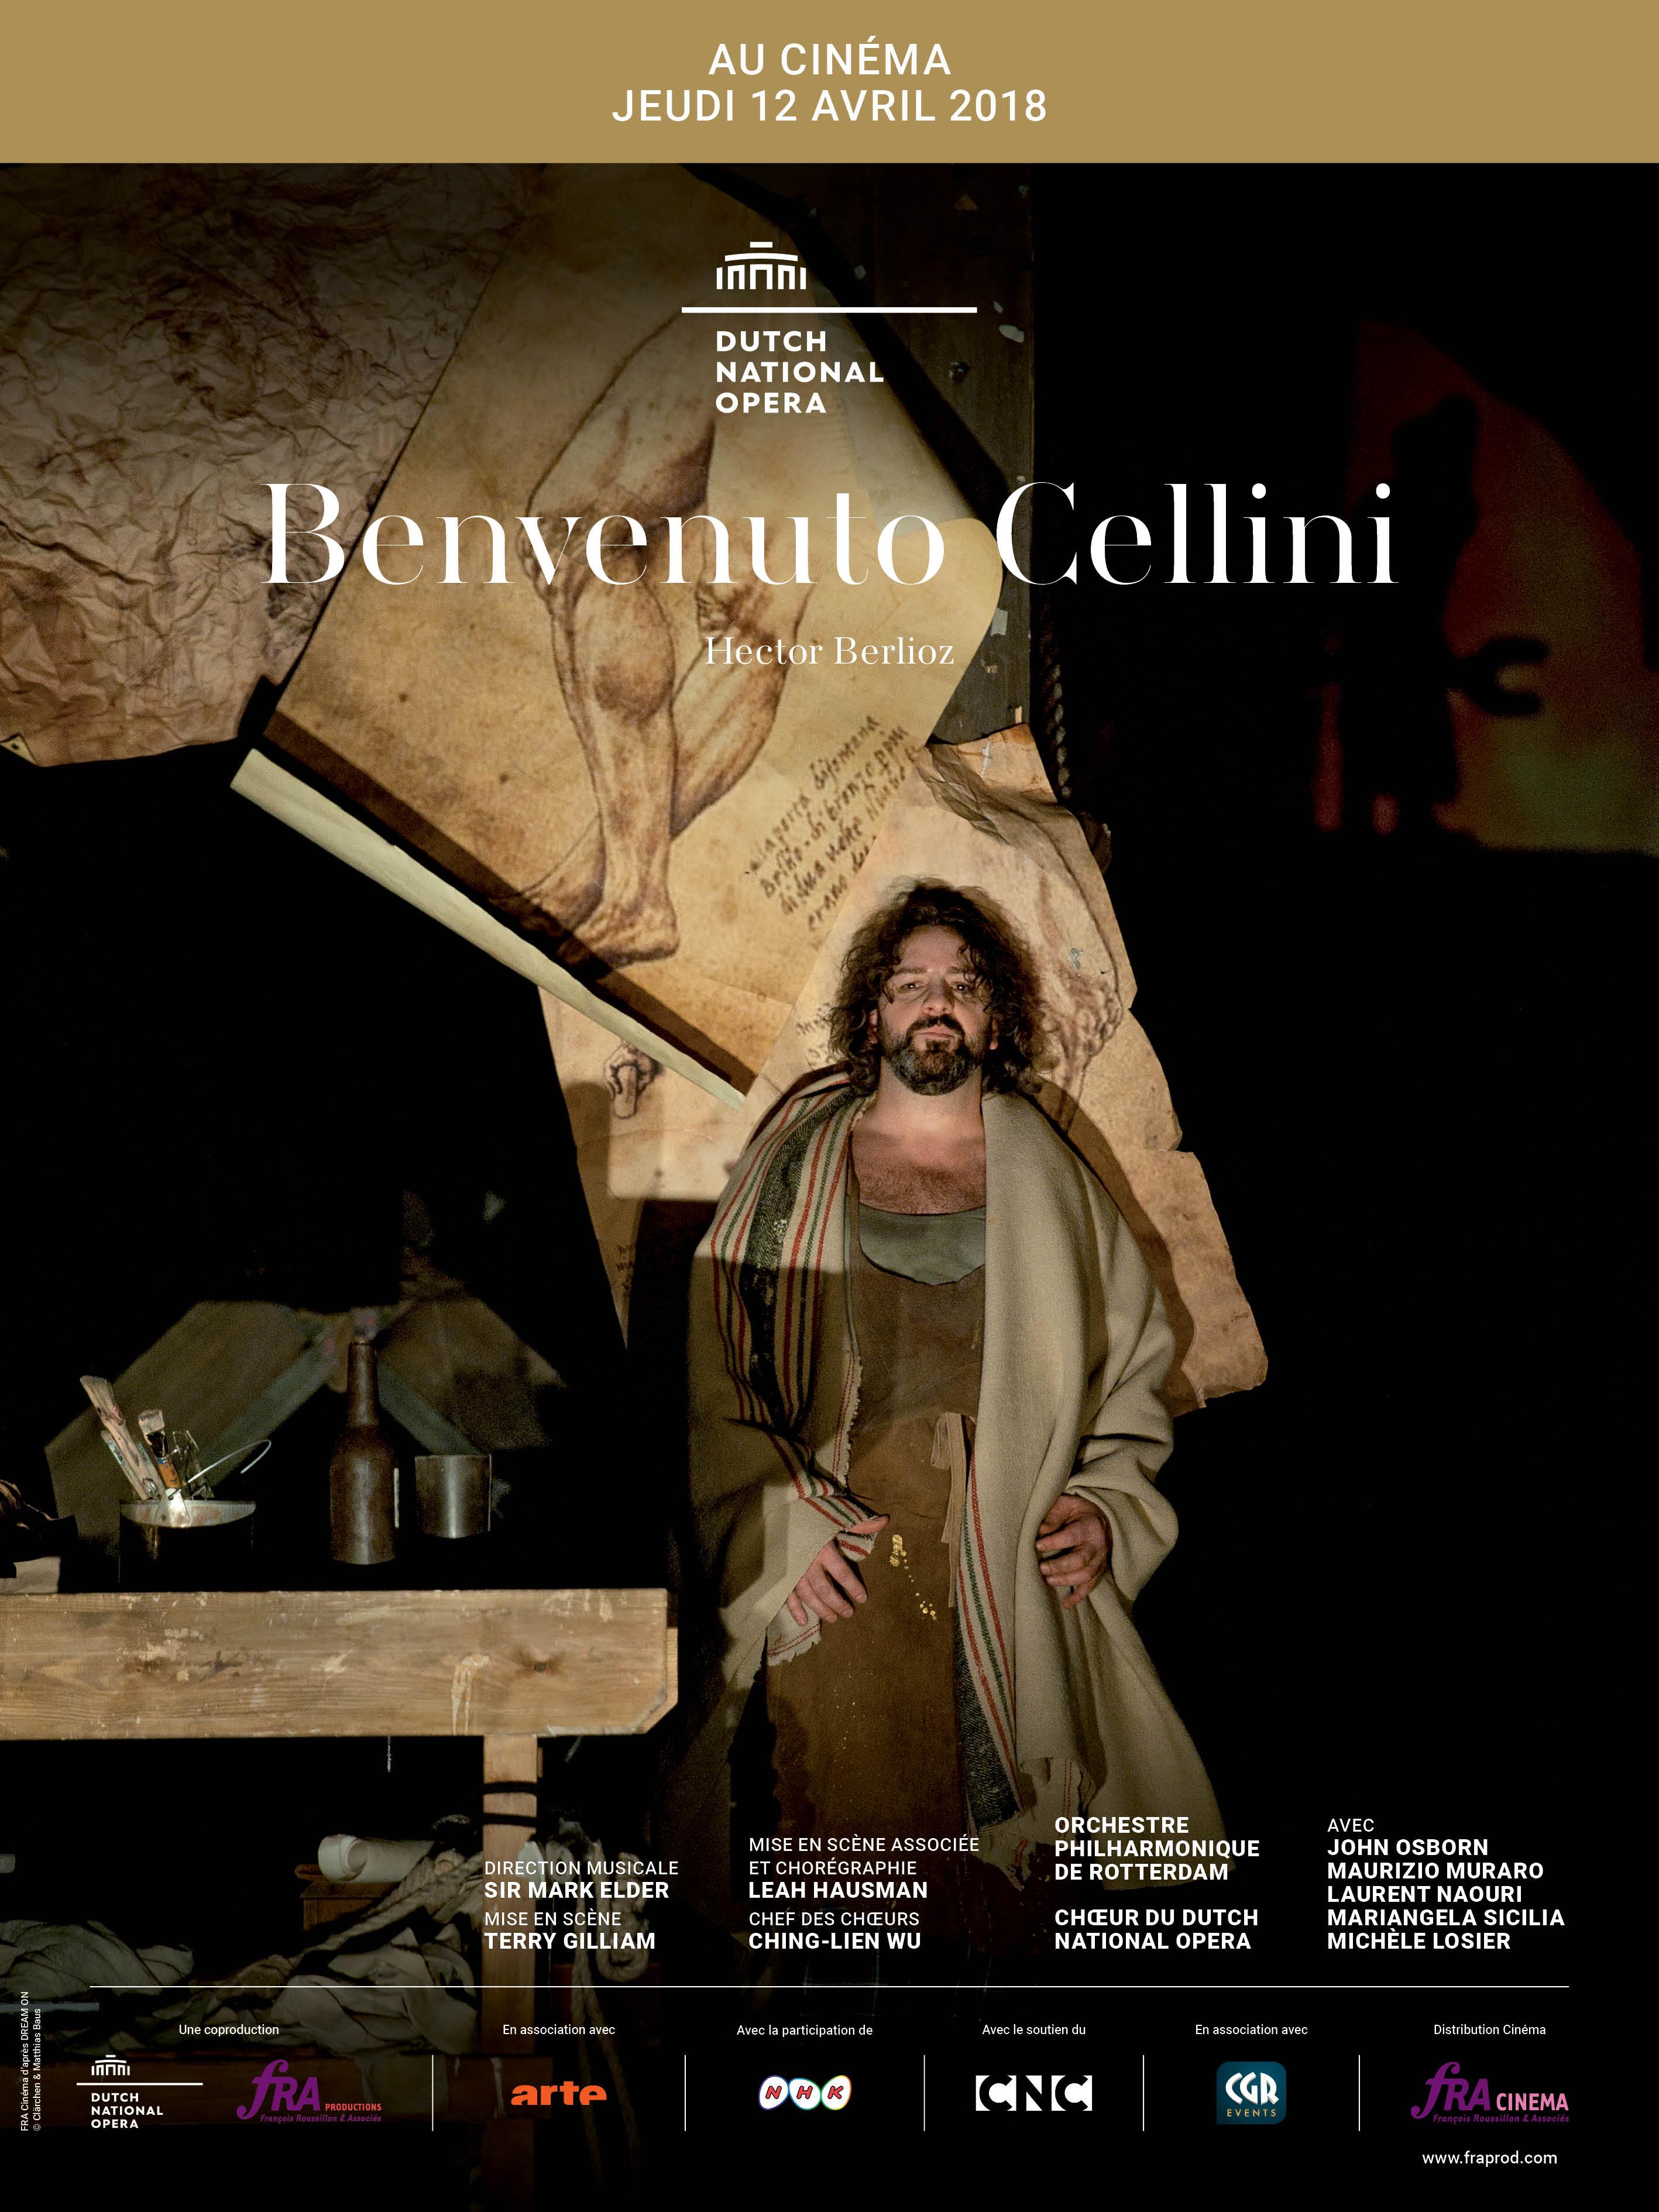 Affiche du film Benvenuto Cellini (De Nationale Opera-FRA Cinéma)